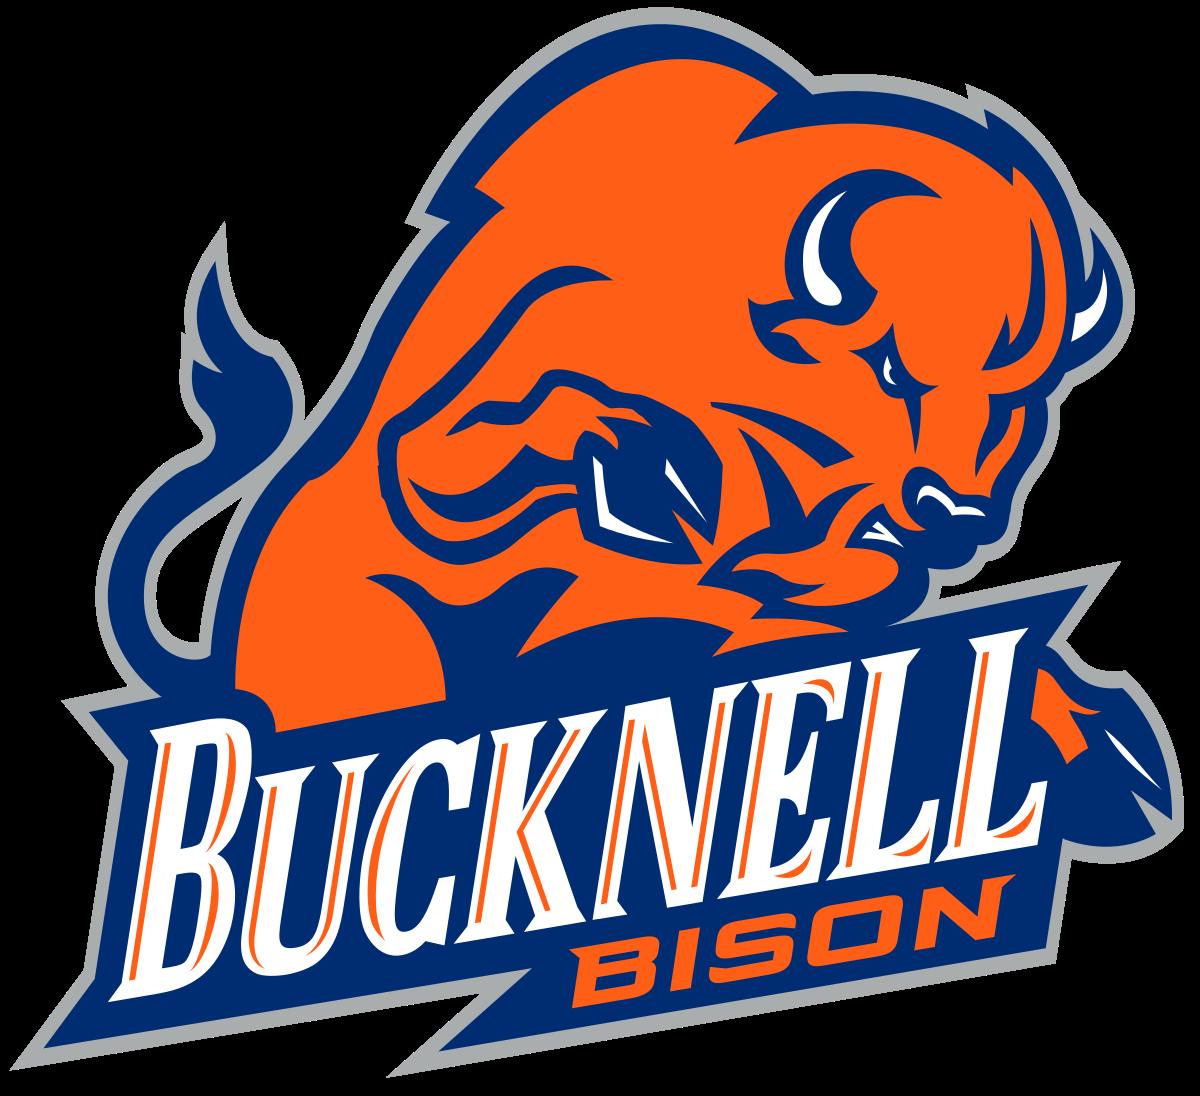 Bucknell University   Lewisburg Pennsylvania NPXC Bison logo 1200x1096